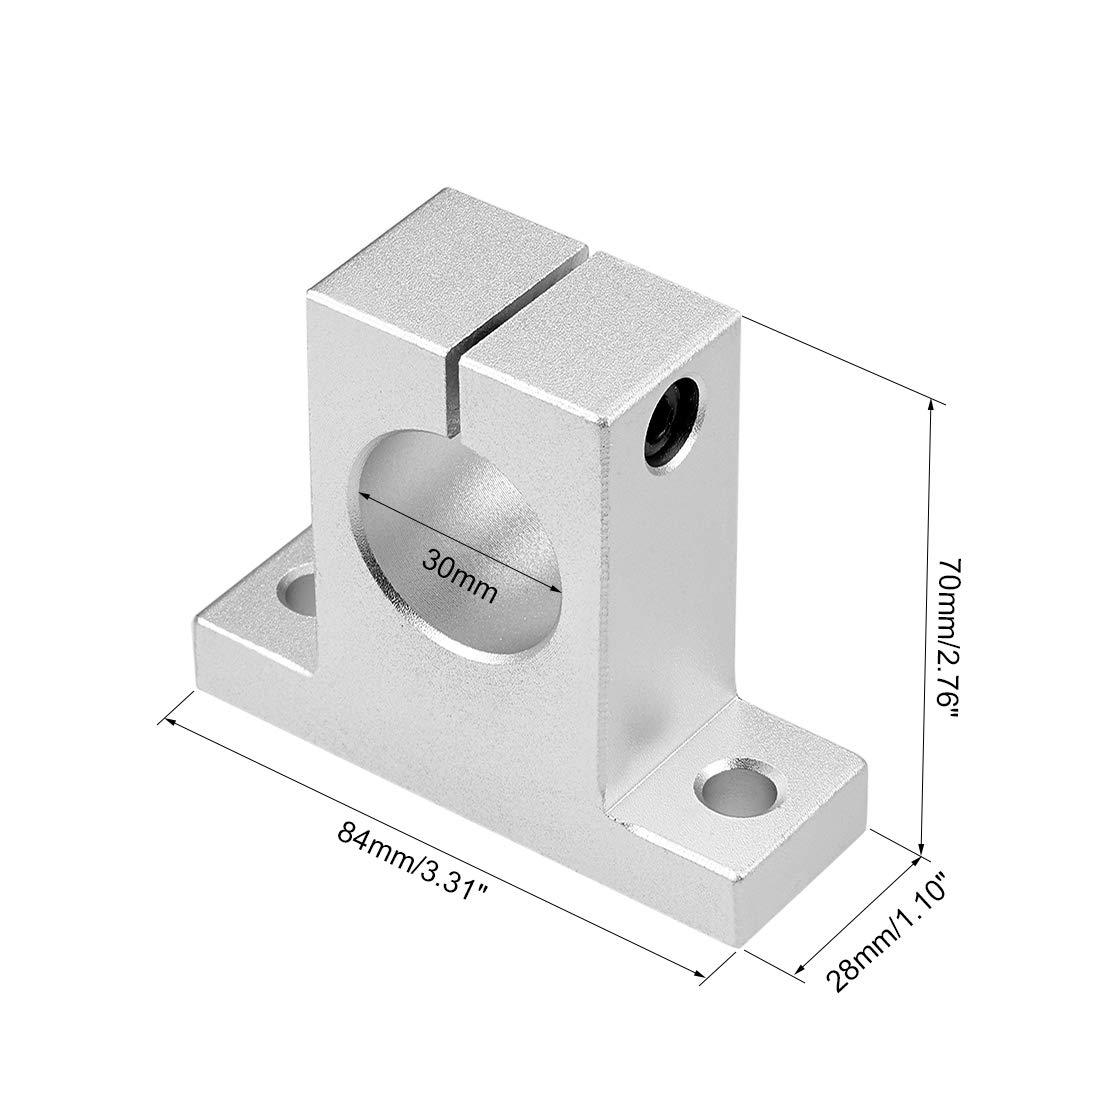 uxcell 20mm Shaft Support SK20 Linear Motion Slide Rail Guide Blocks for CNC 3D Printer Pack of 2